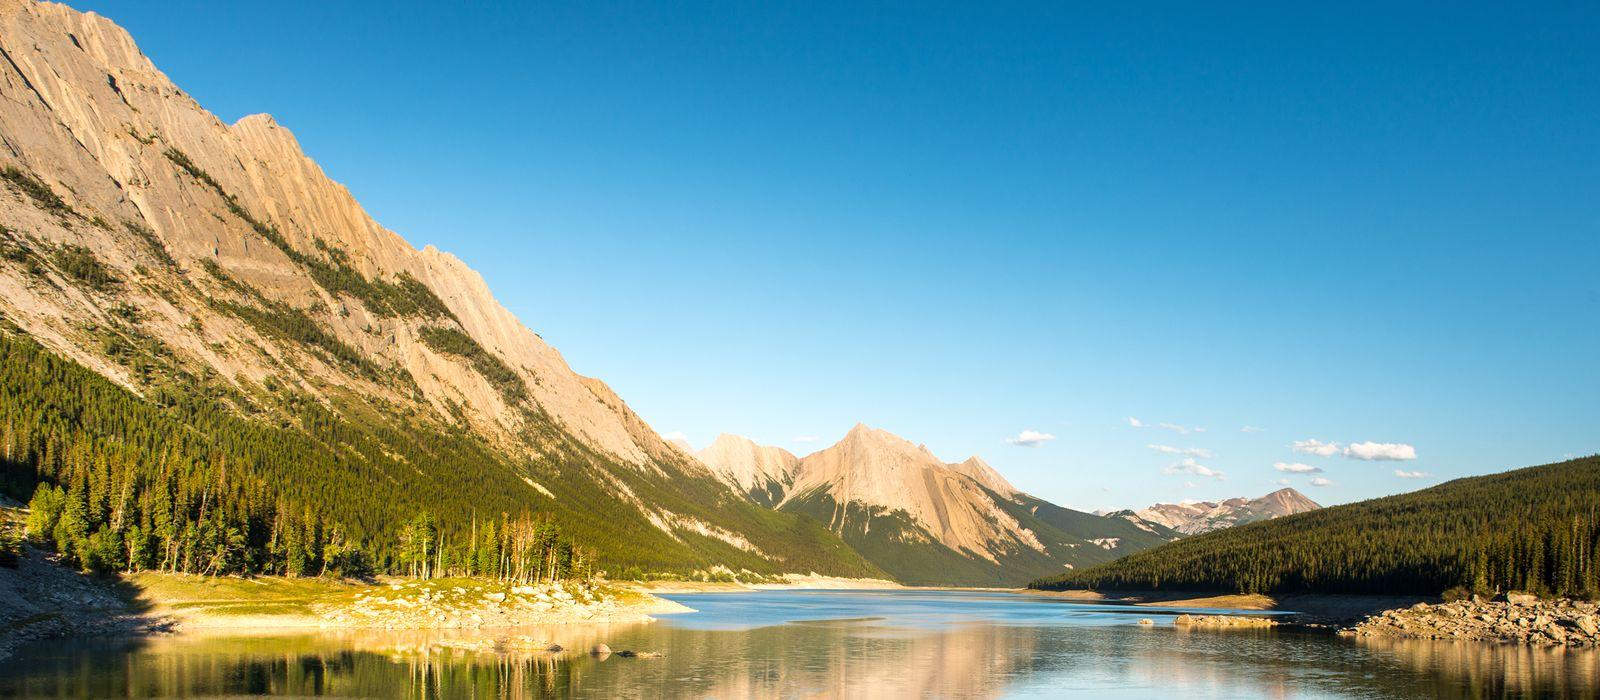 Der Medicine Lake im Jasper Nationalpark